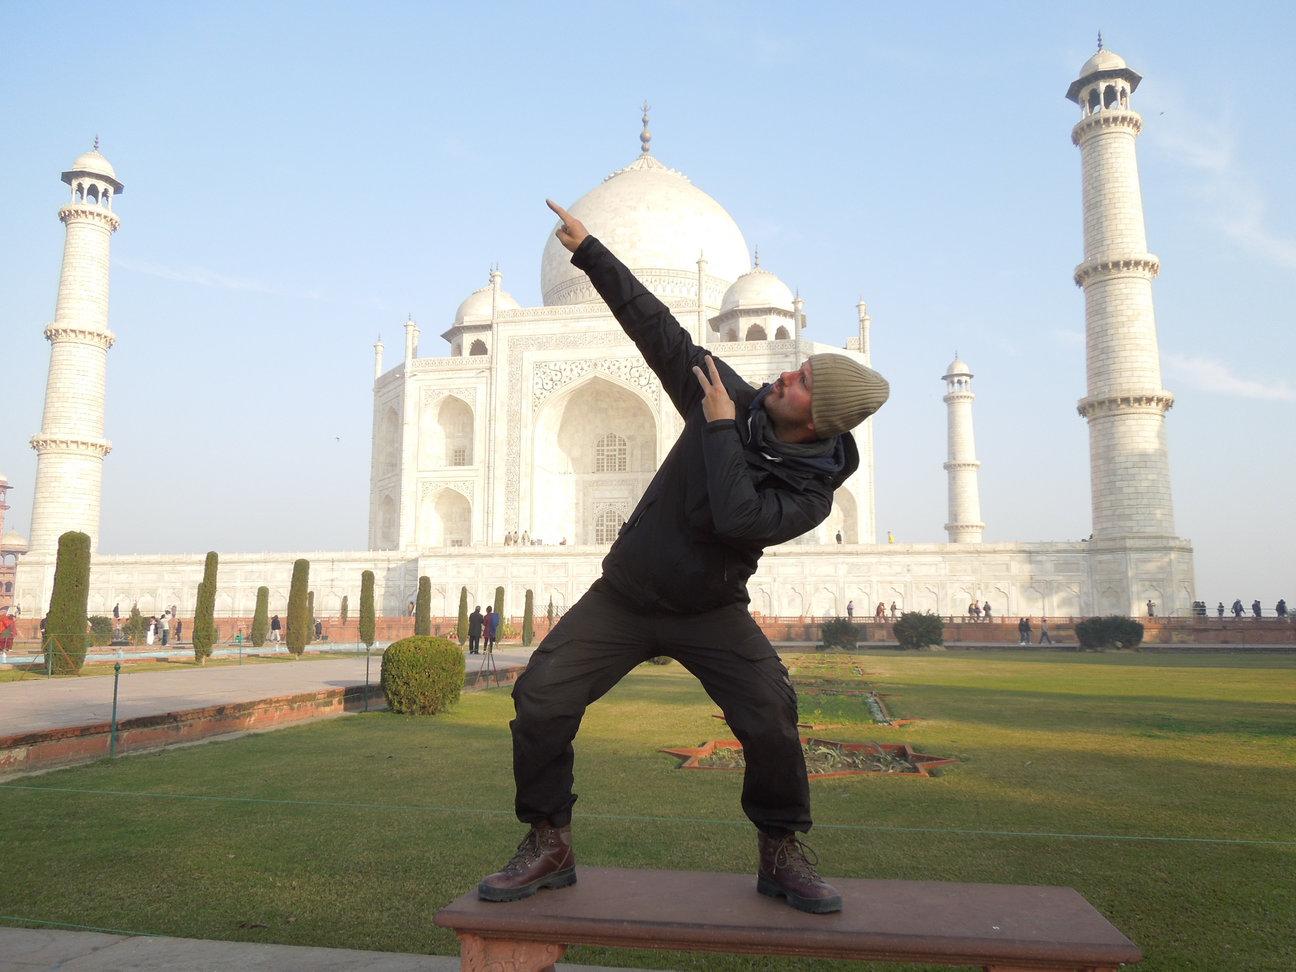 busting-moves-taj-mahal.jpg